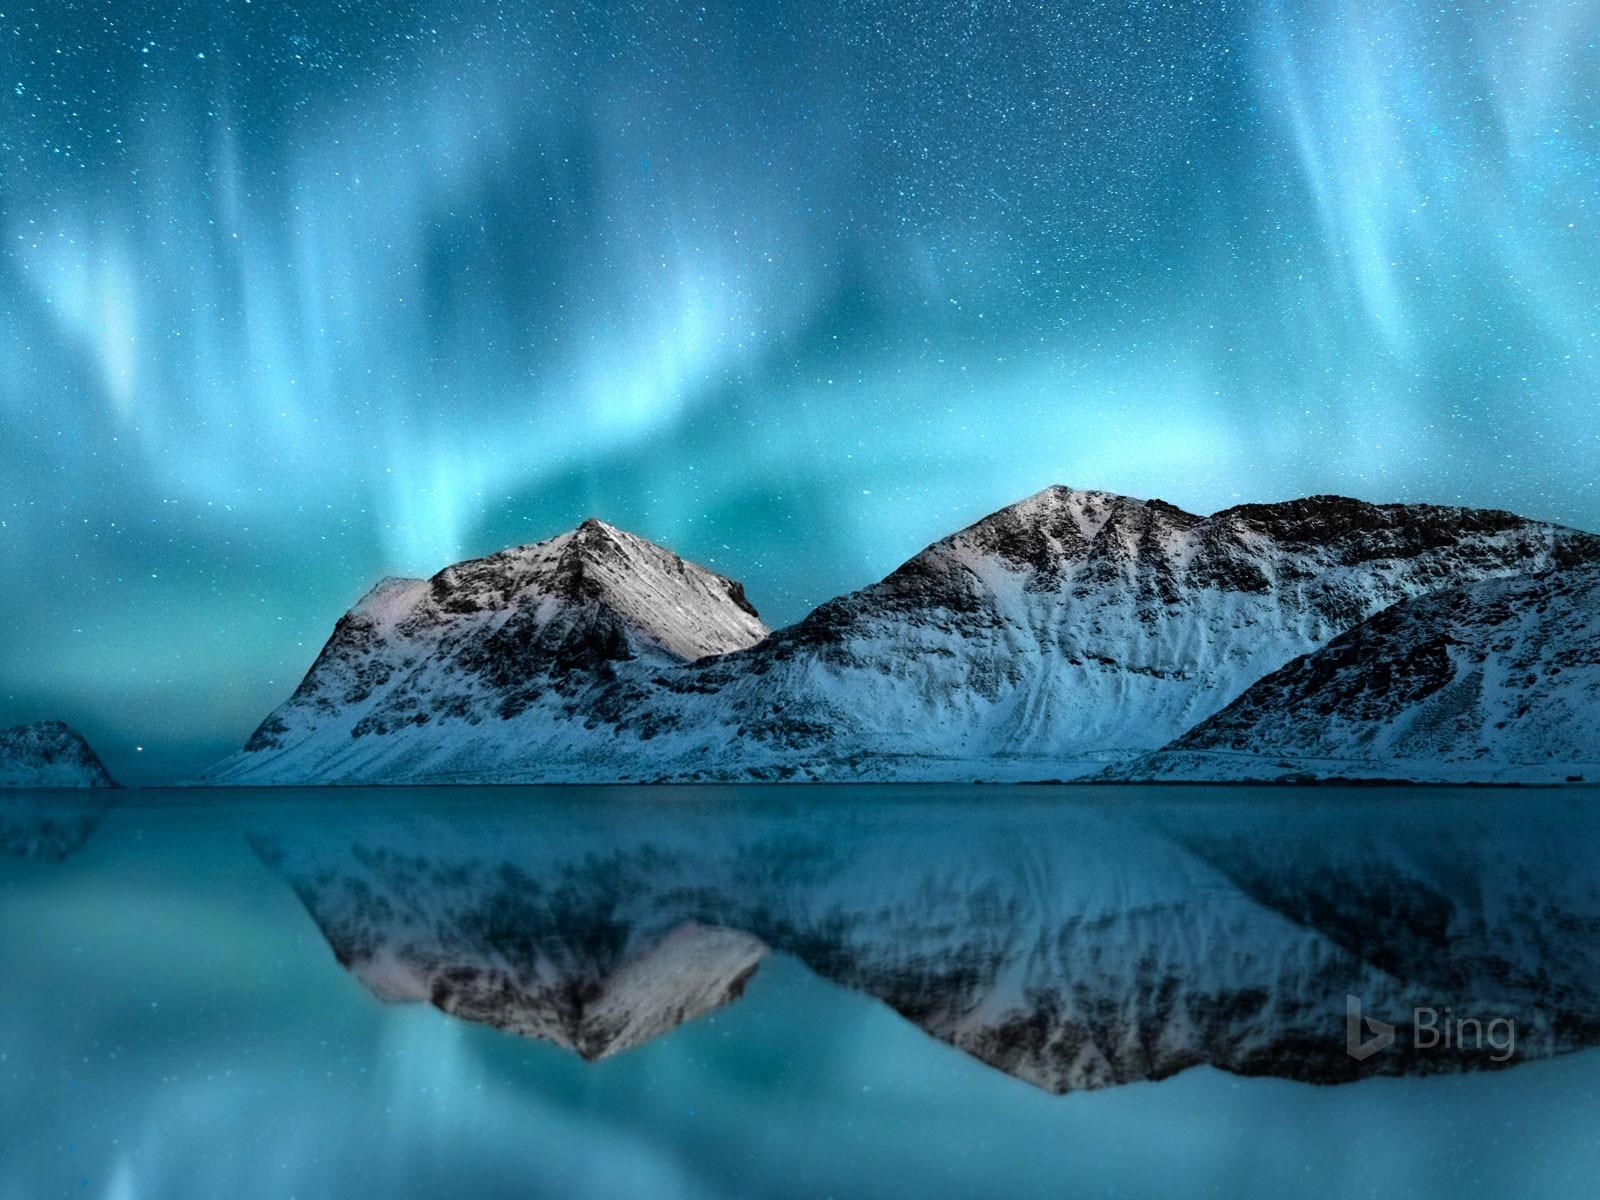 Iphone 5s Stock Wallpaper Norway Aurora Borealis Lofoten 2018 Bing Wallpaper Preview